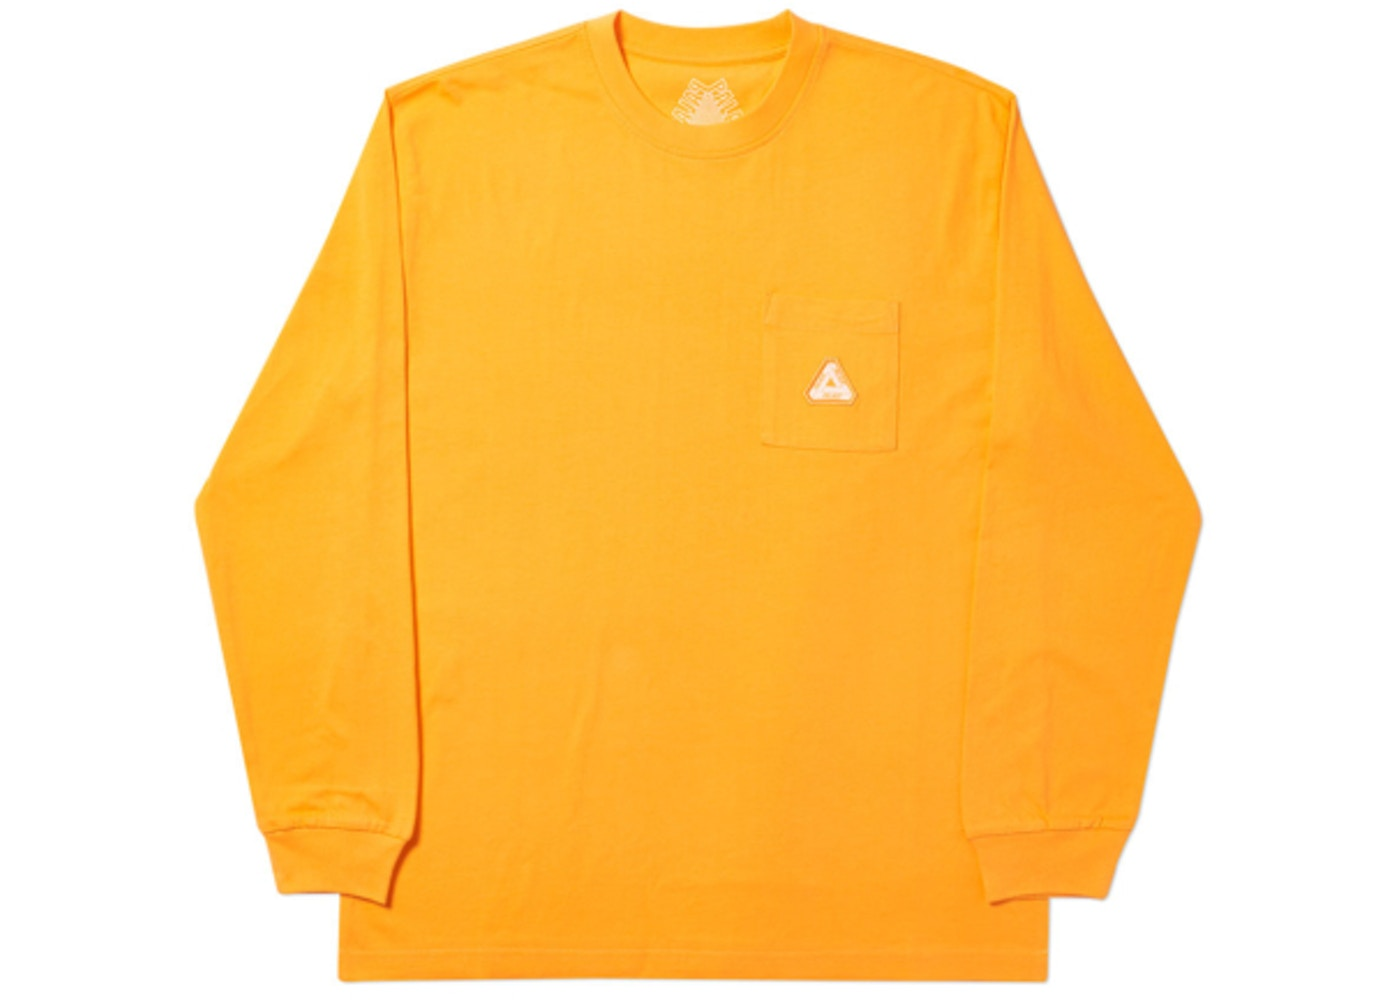 dfd336a8 Palace Sofar Pocket Longsleeve Orange - SS19